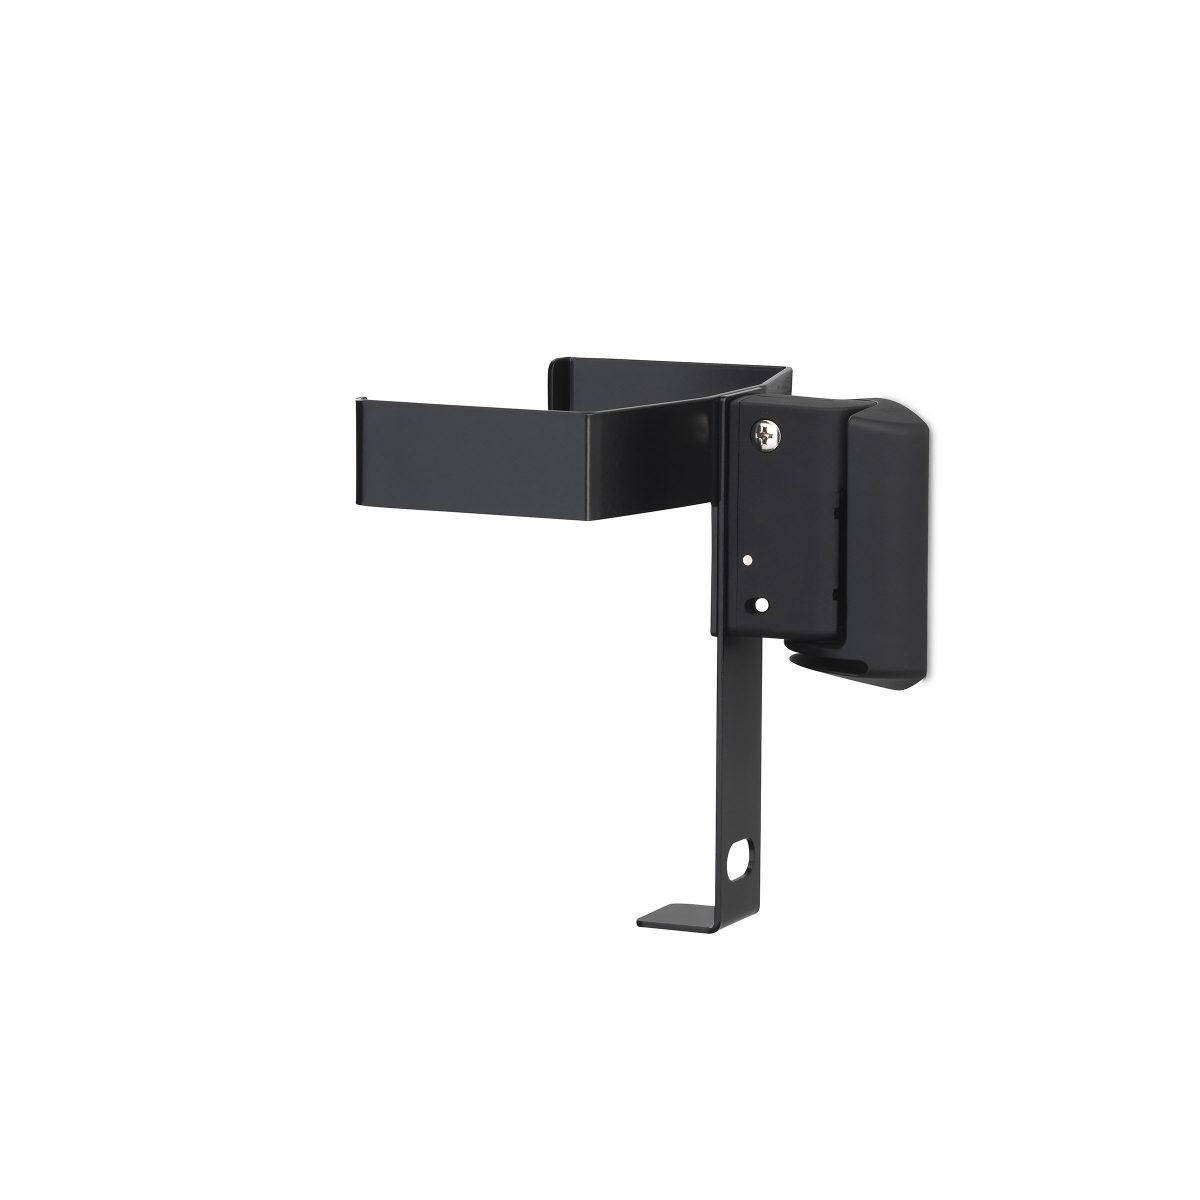 Bose SoundTouch 10 Muurbeugel zwart 13